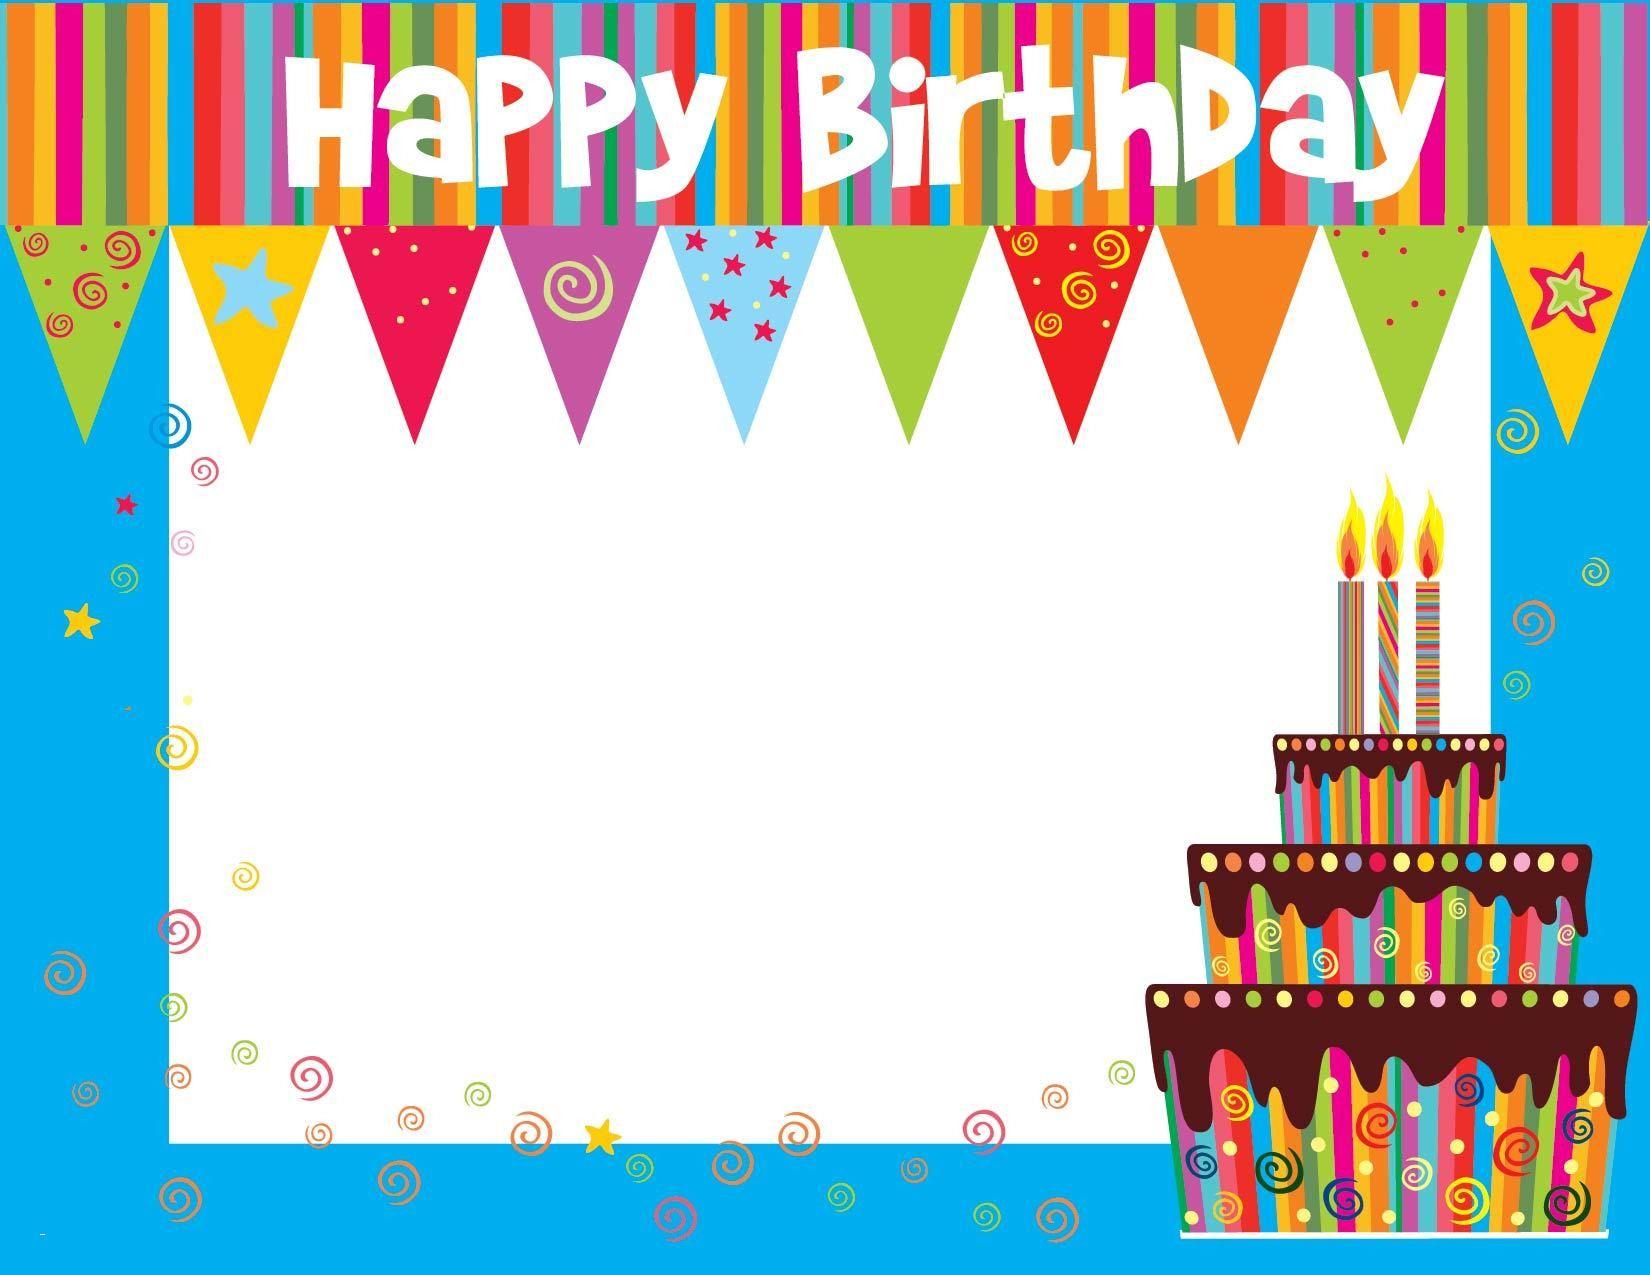 Birthday Card Template Birthday card template free, Free